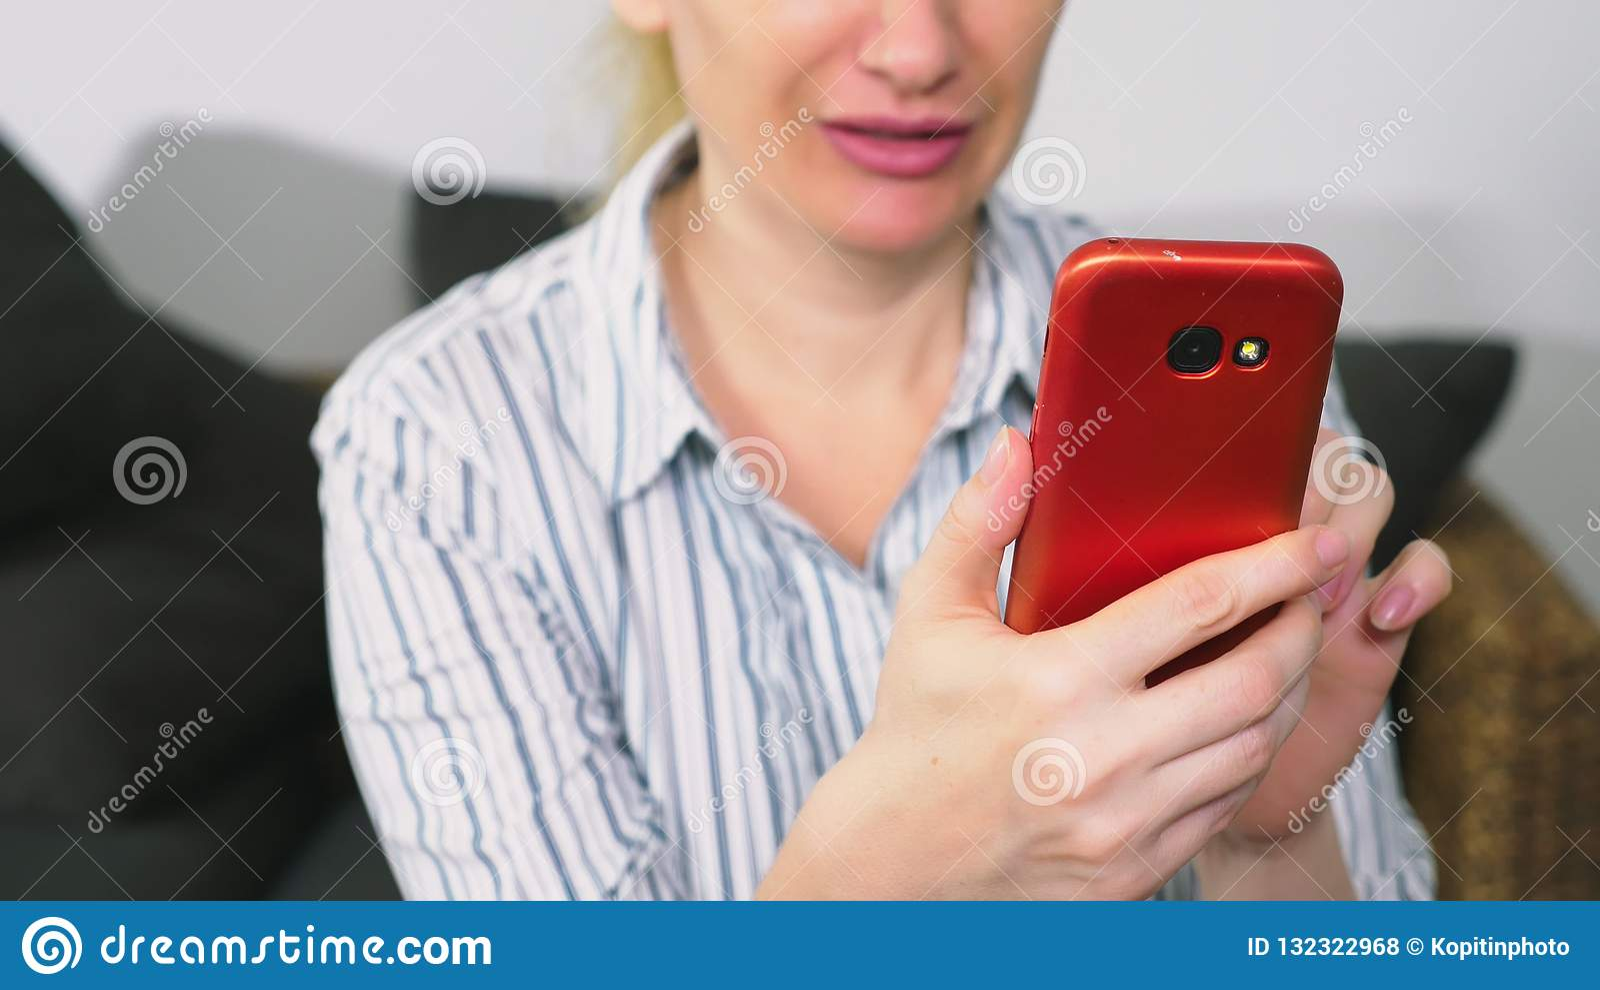 Flirting talking about kissing her [PUNIQRANDLINE-(au-dating-names.txt) 44